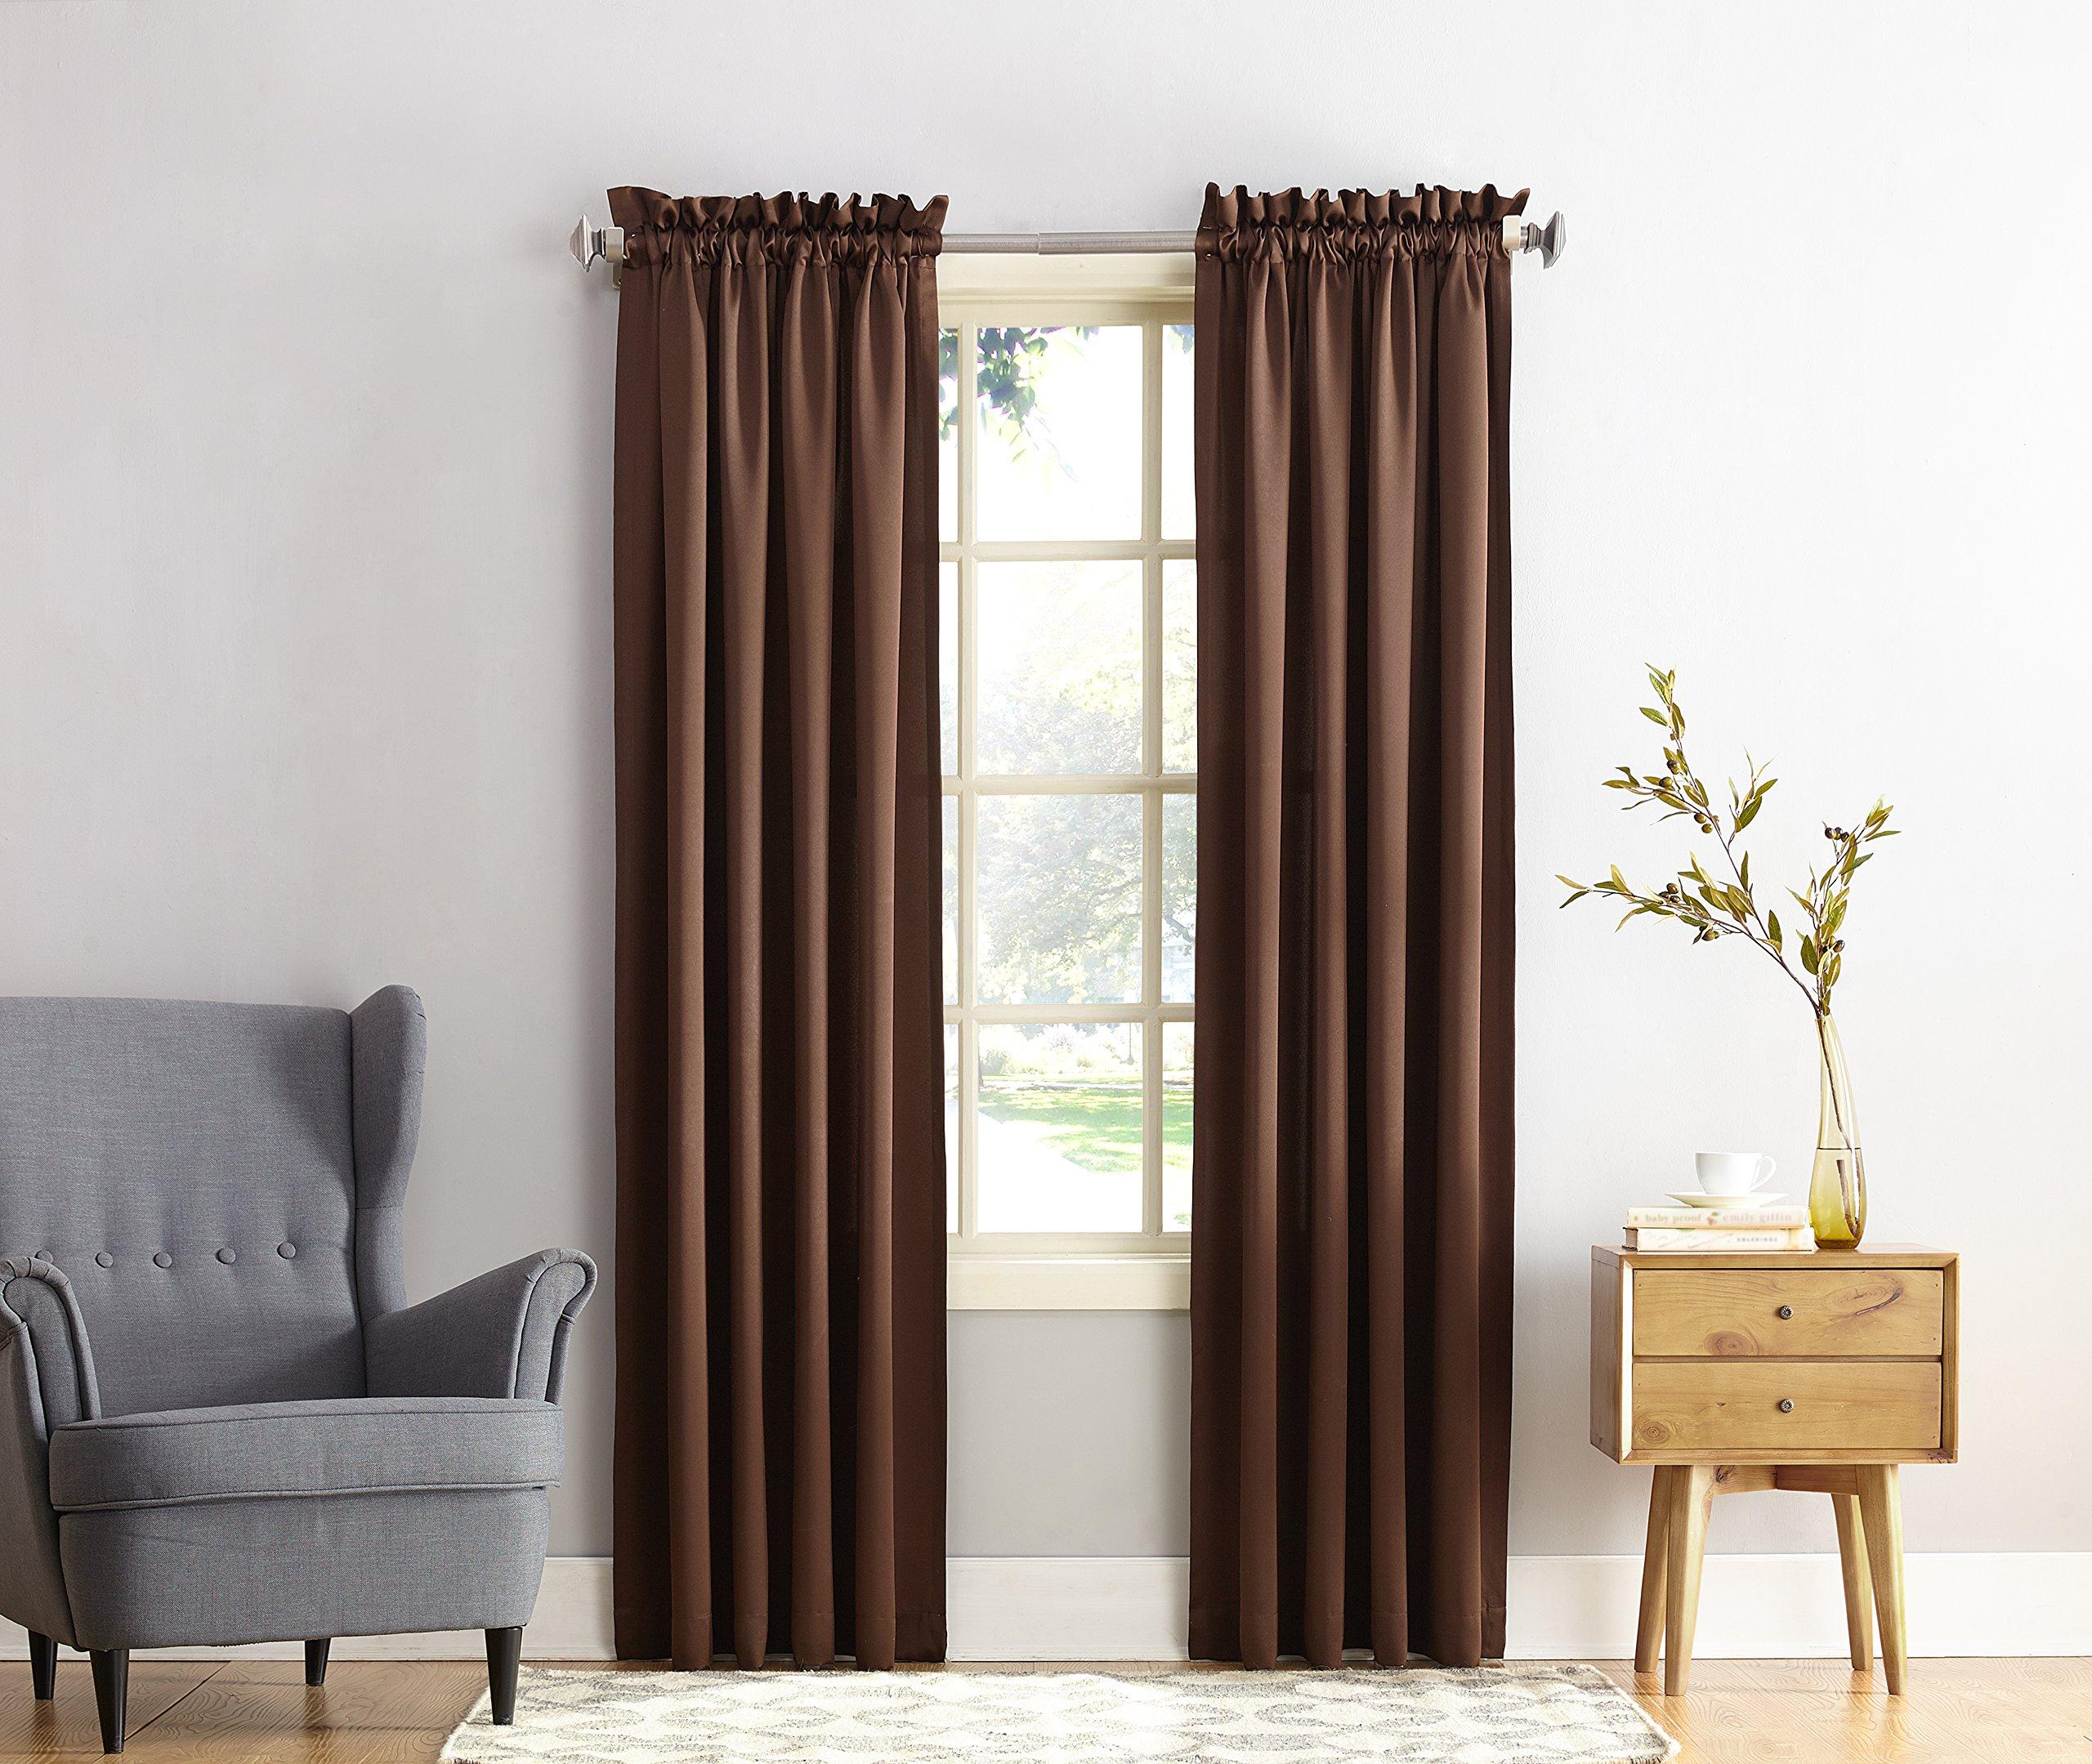 cortinas doradas para cocina comedor cortinas grandes